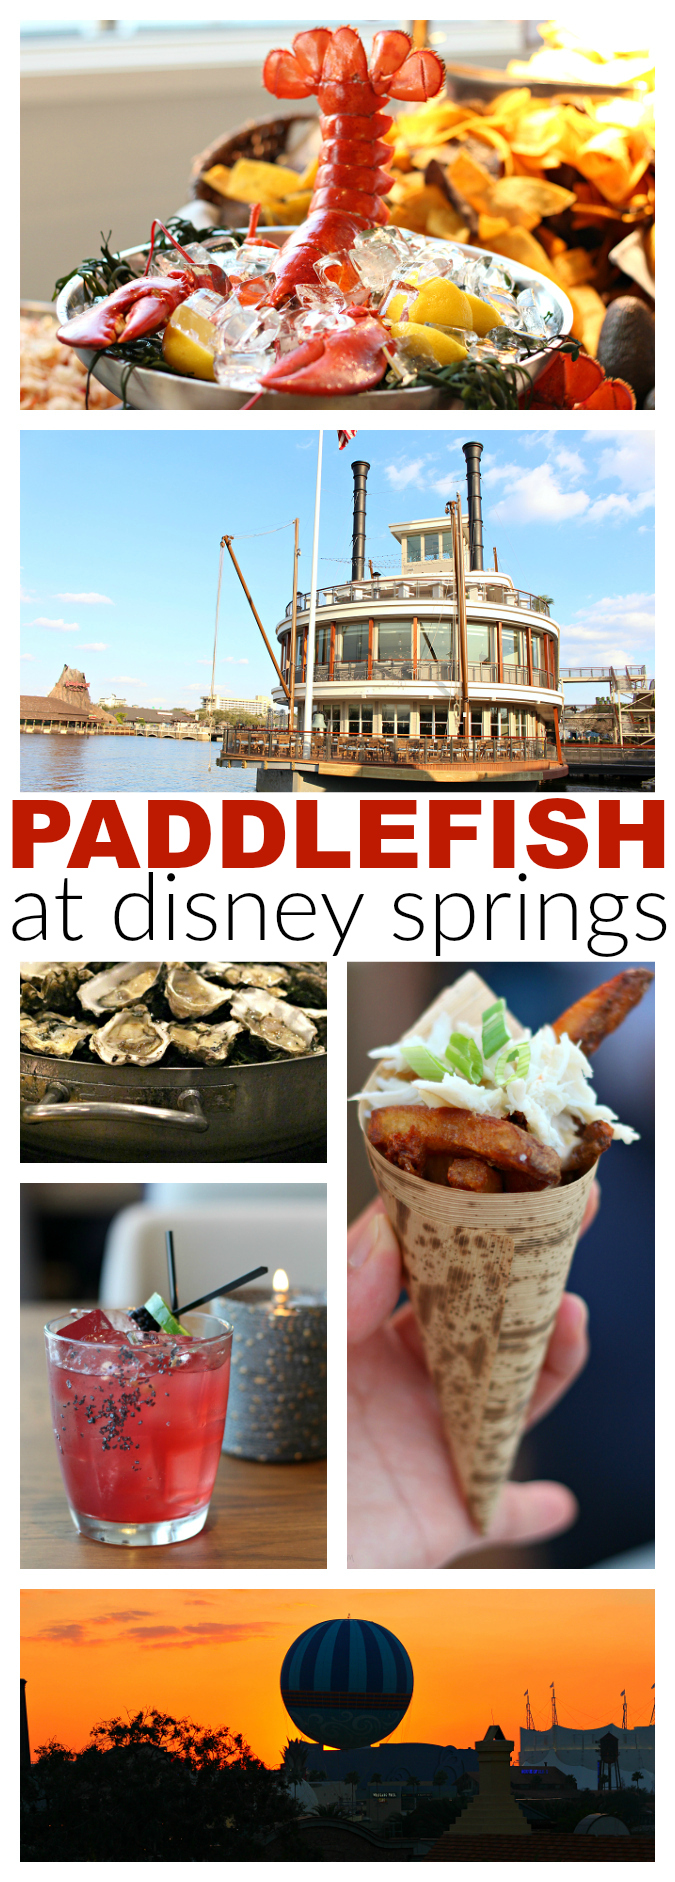 Paddlefish restaurant review at Disney springs